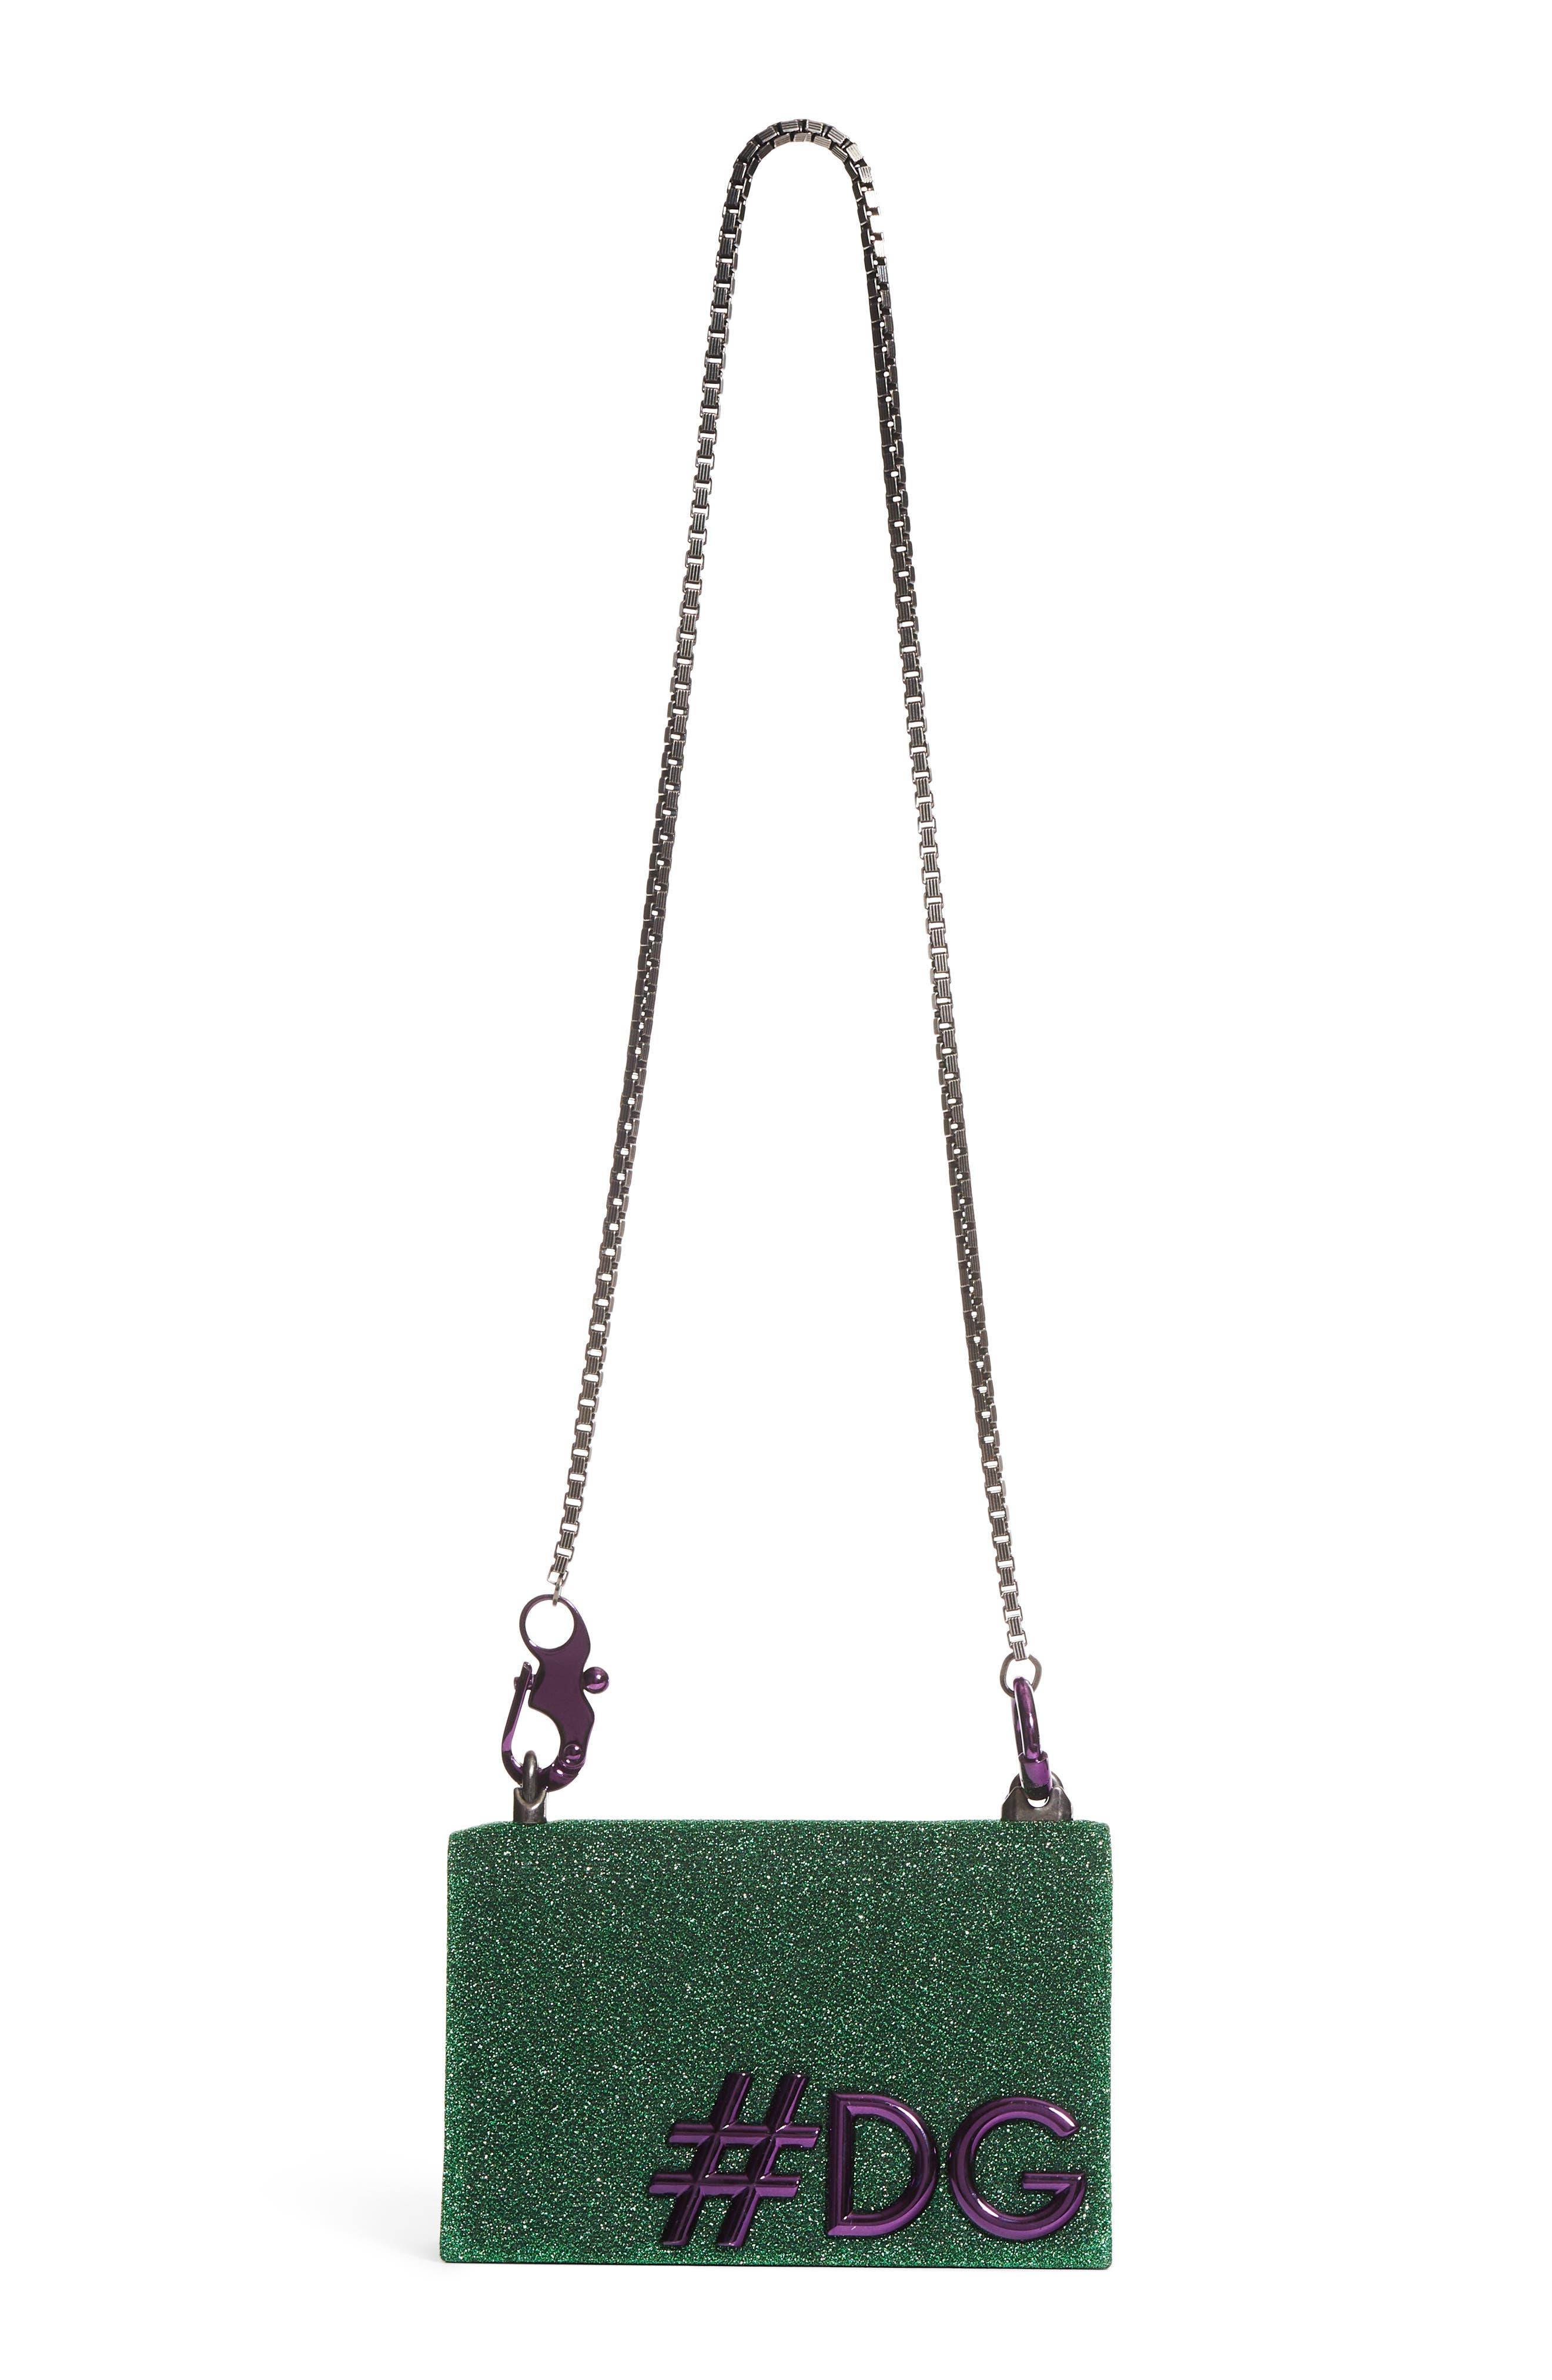 DG Girls Metallic Shoulder Bag,                         Main,                         color, Green